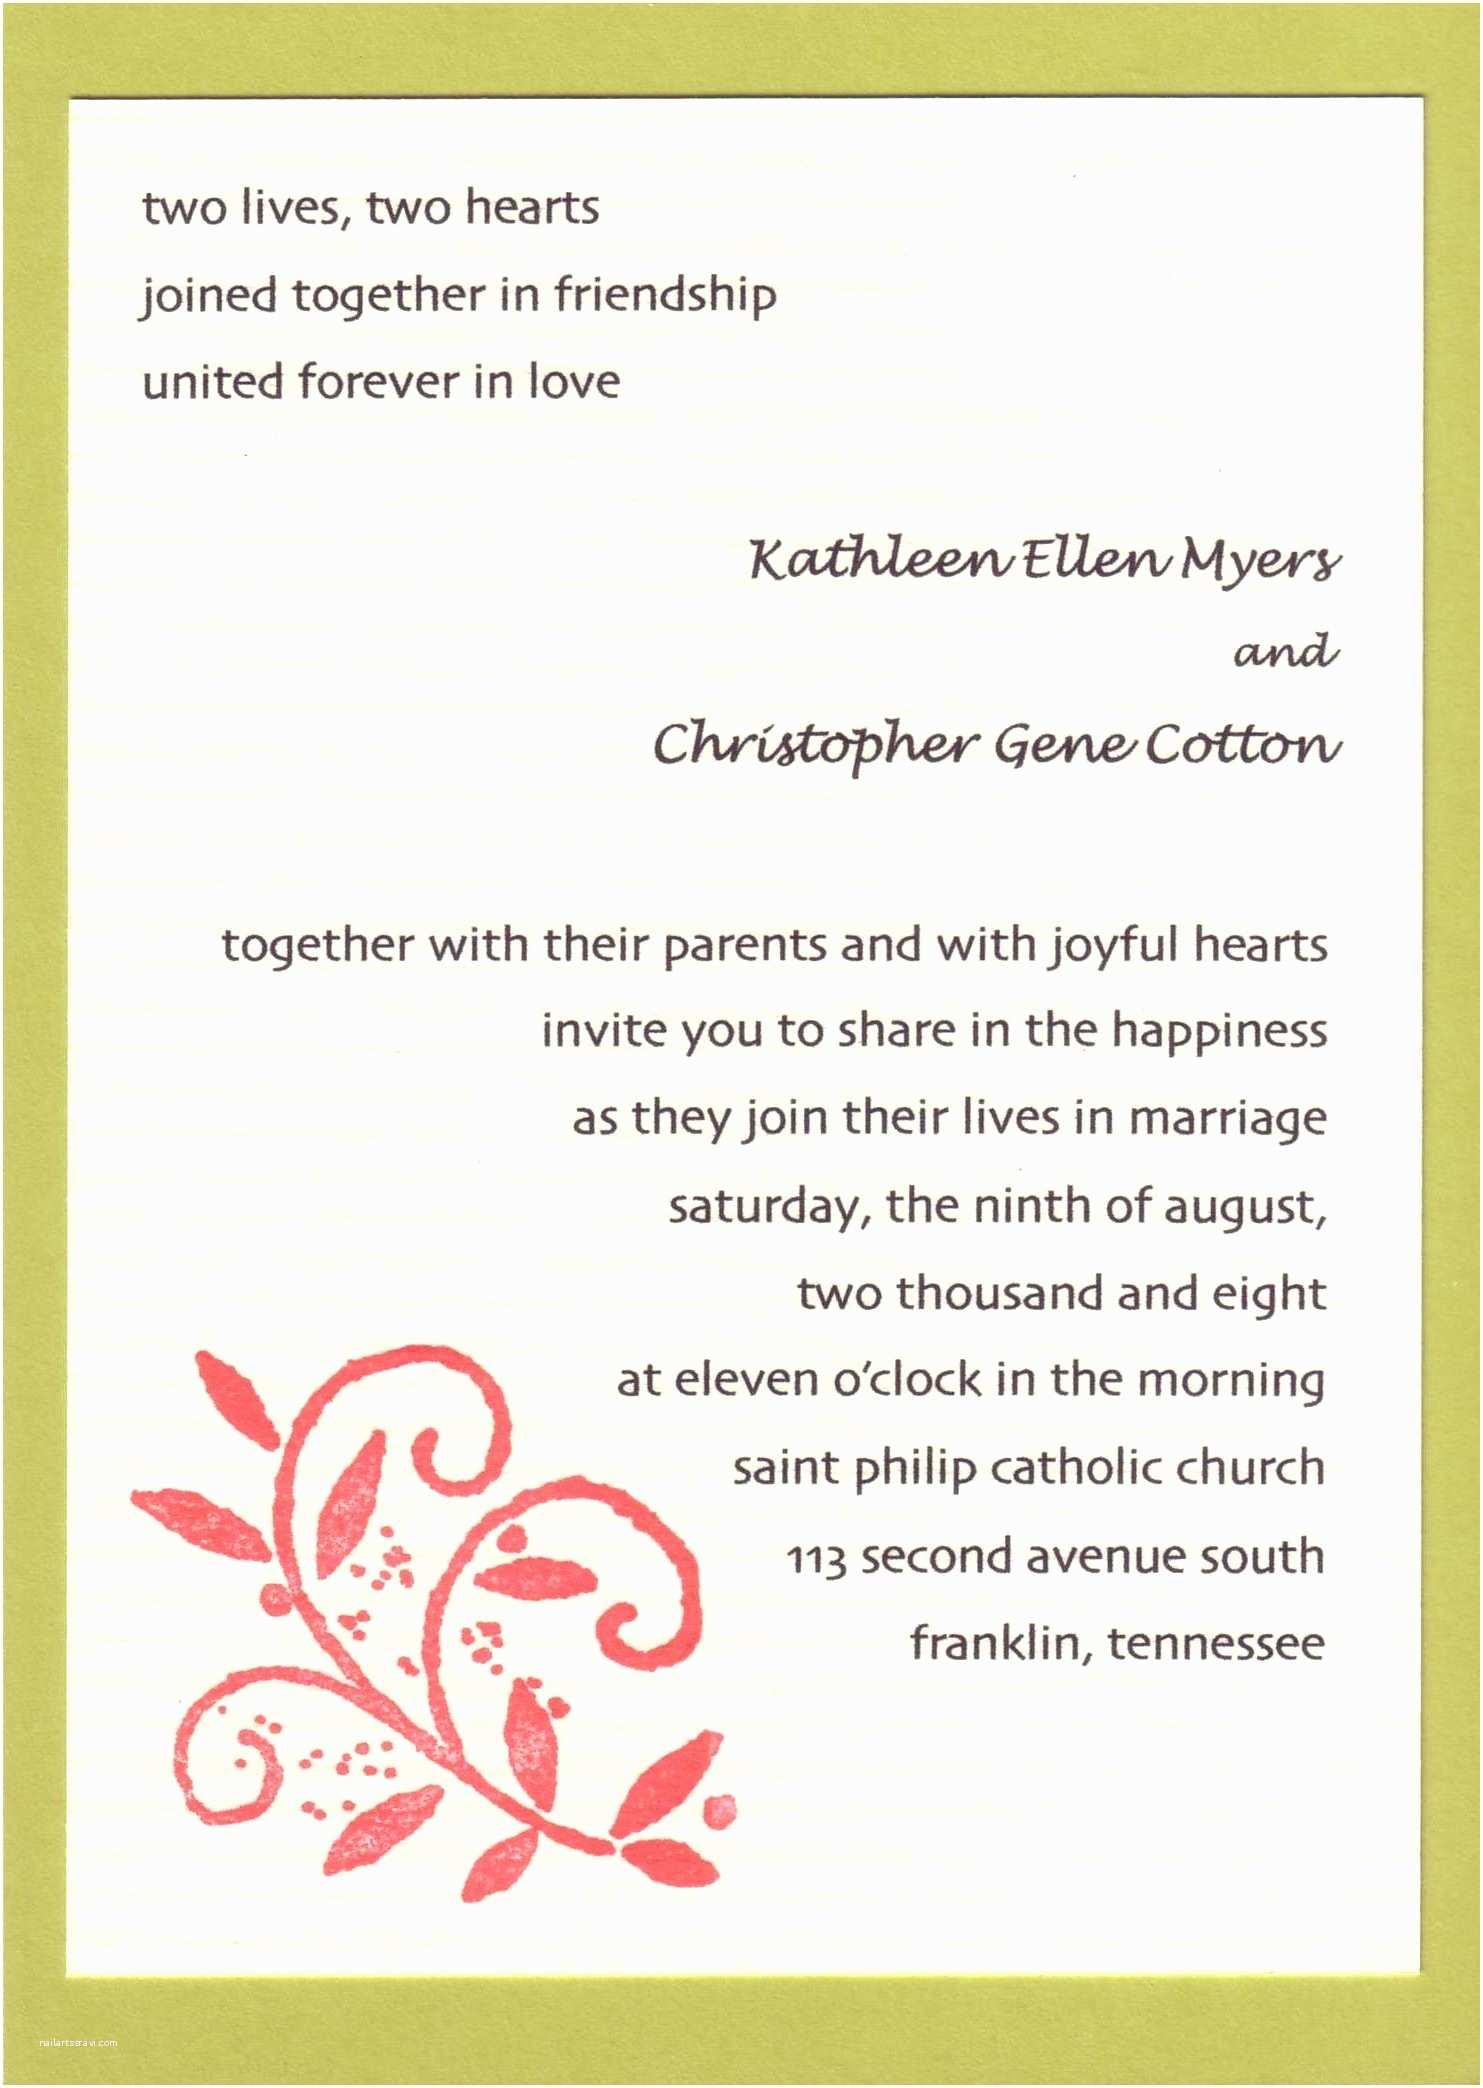 Wedding Invitation Phrases for Friends Wedding Invitation Wording Examples for Friends – Mini Bridal